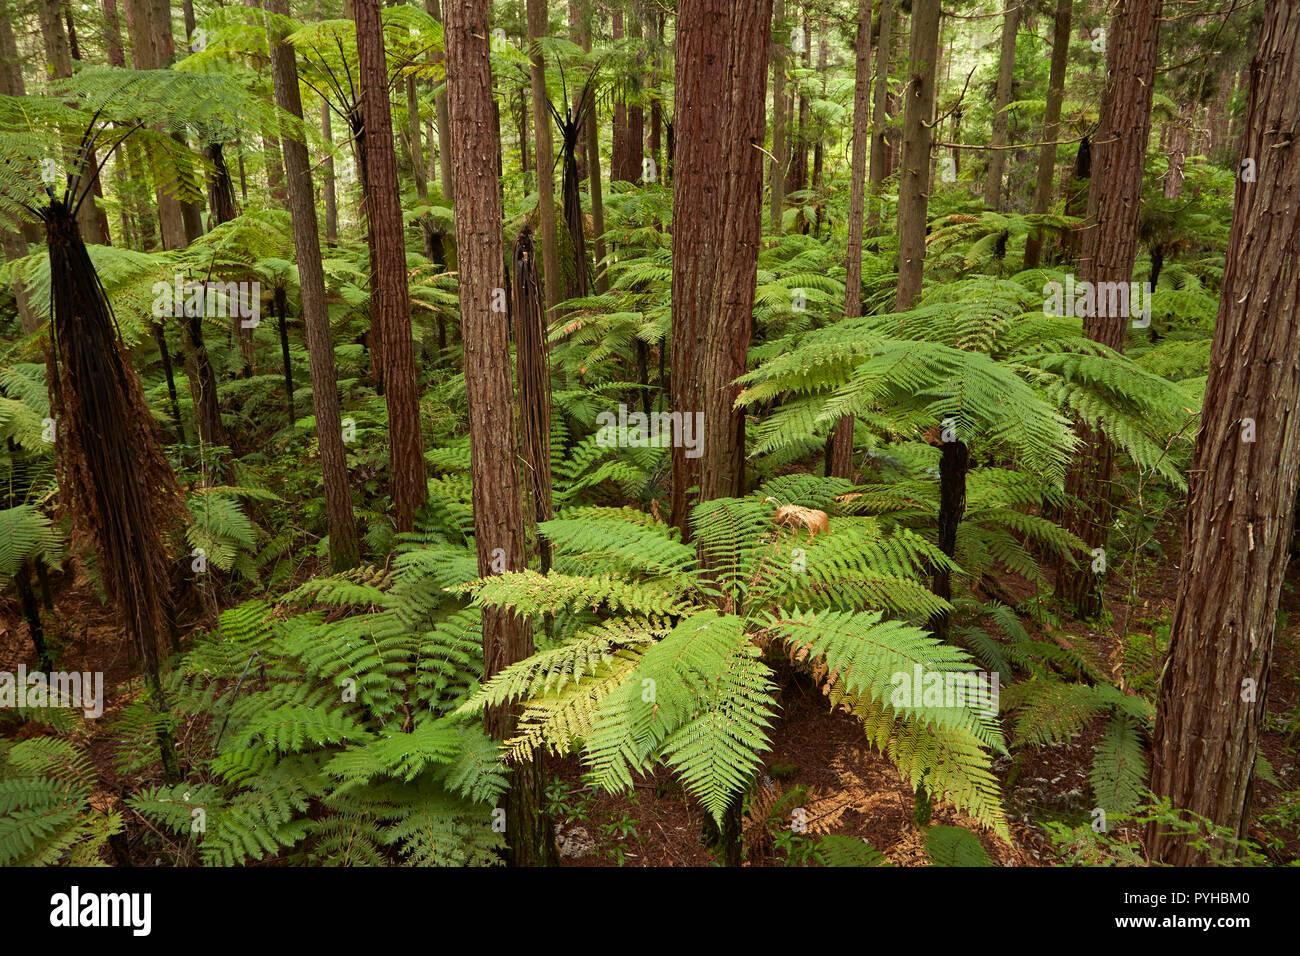 View over redwoods and ferns from Redwoods Treewalk at The Redwoods (Whakarewarewa Forest), Rotorua, North Island, New Zealand - Stock Image